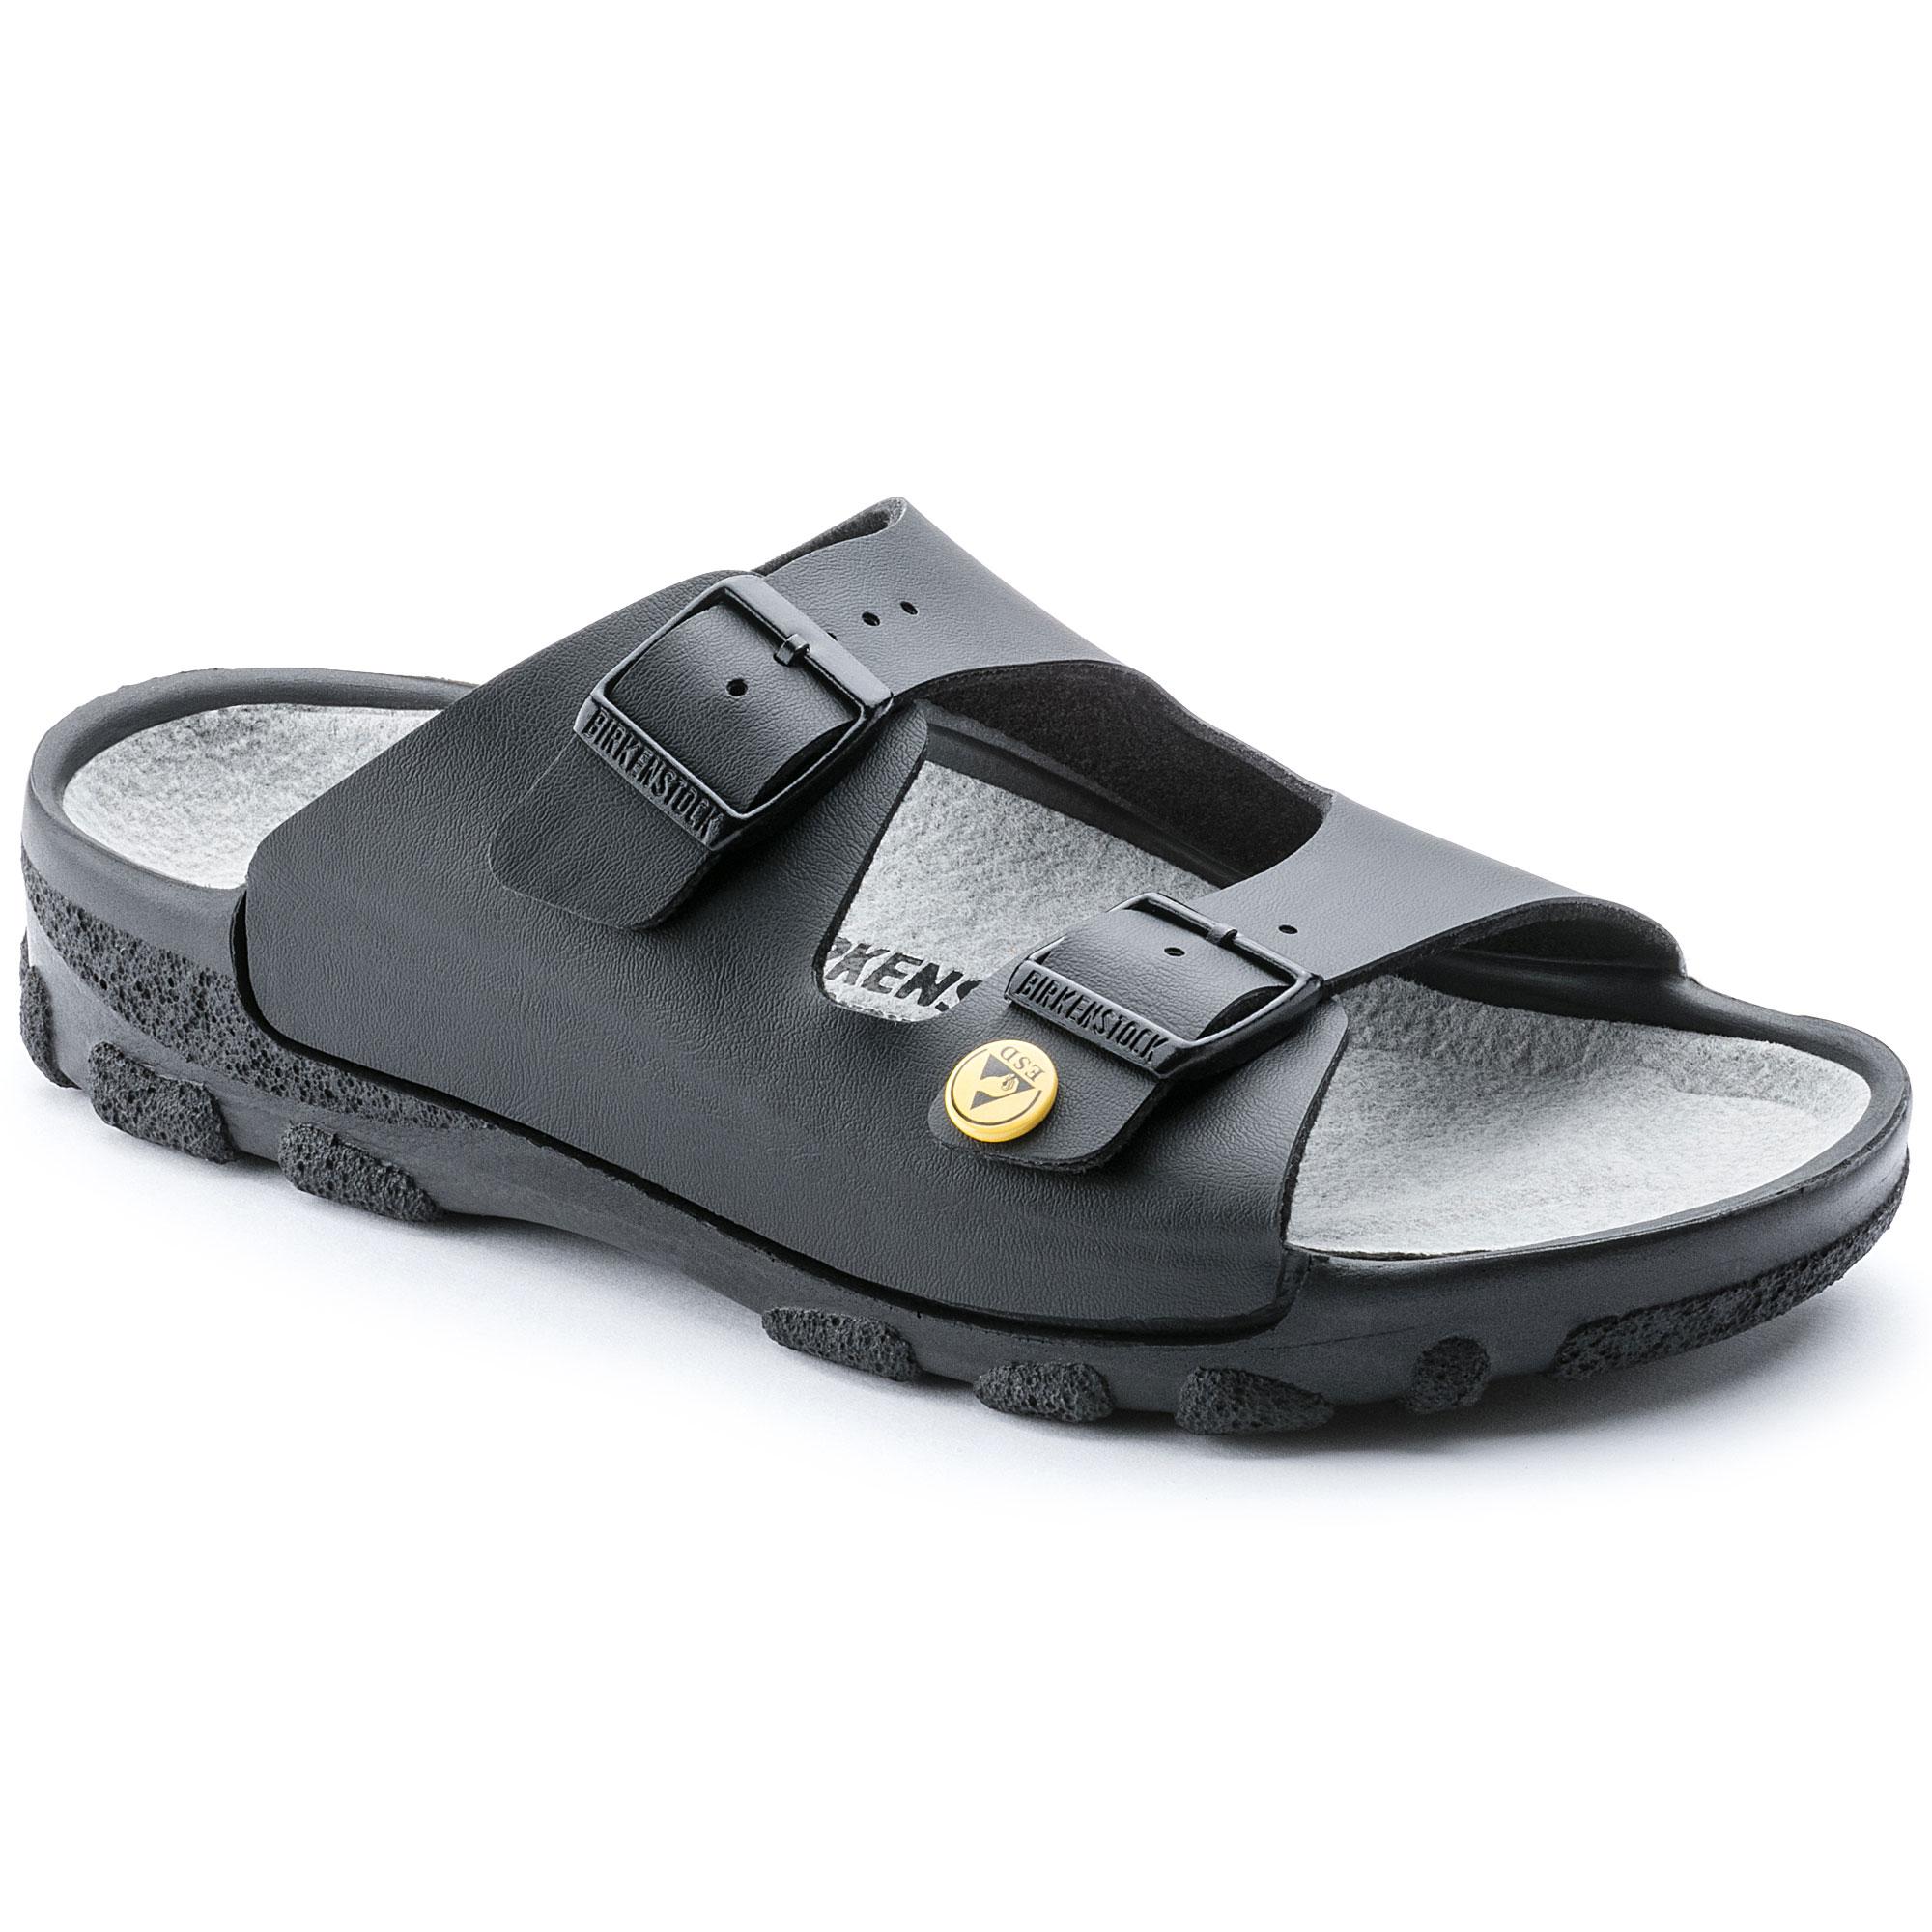 BIRKENSTOCK ARIZONA regular article ビルケンシュトックアリゾナ ESD leather 089420 089428 [black] static electricity measures sandals men gap Dis 2018 new work in